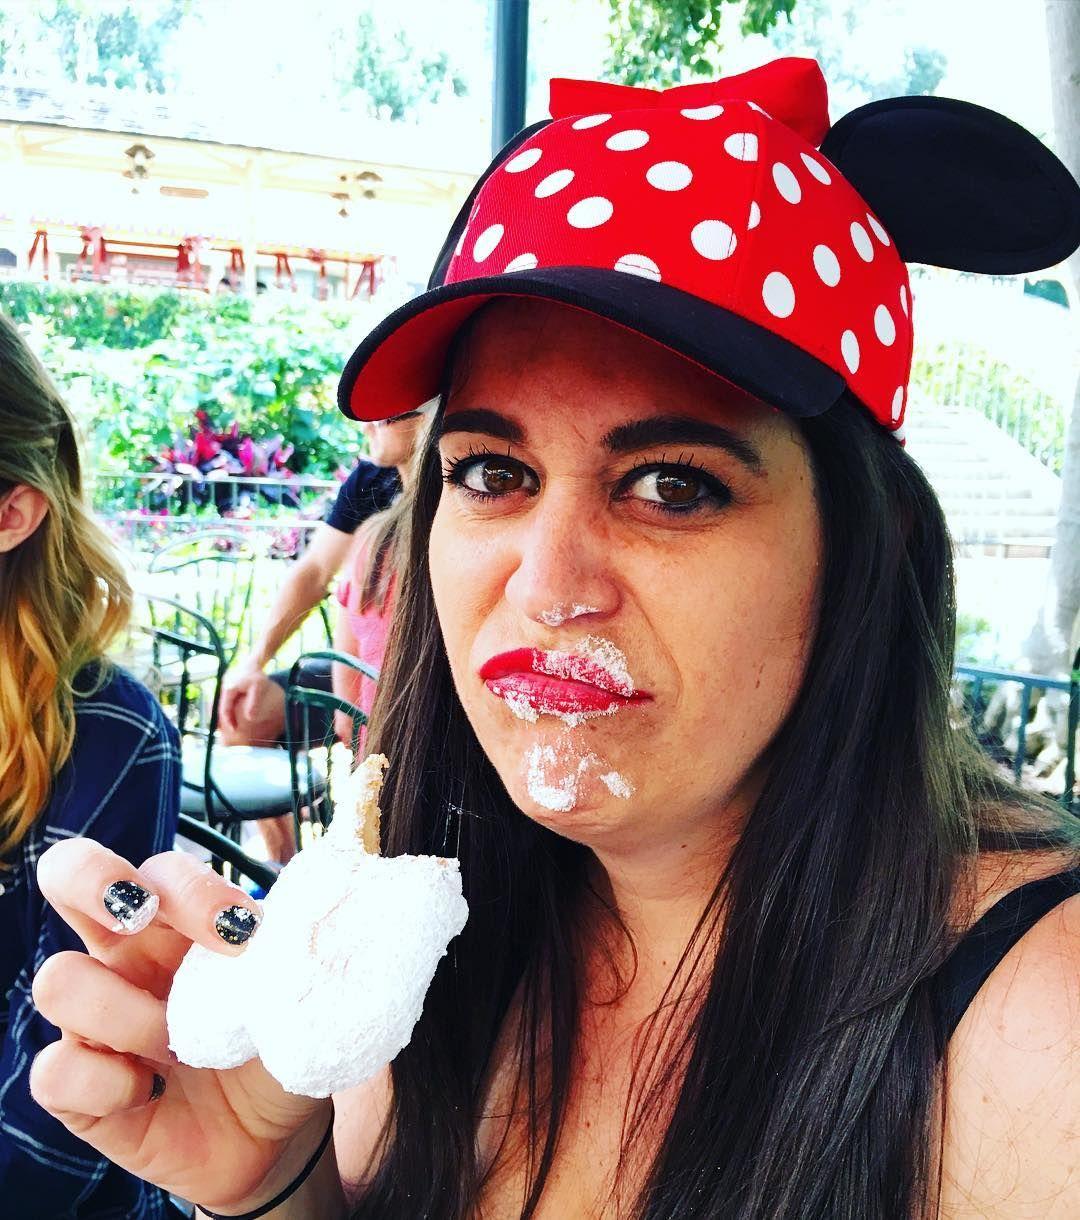 Beignet to the Face! #CantStappWontStapp #MickeyBeignet #FrenchQuarter #Disneyland by kenjie9